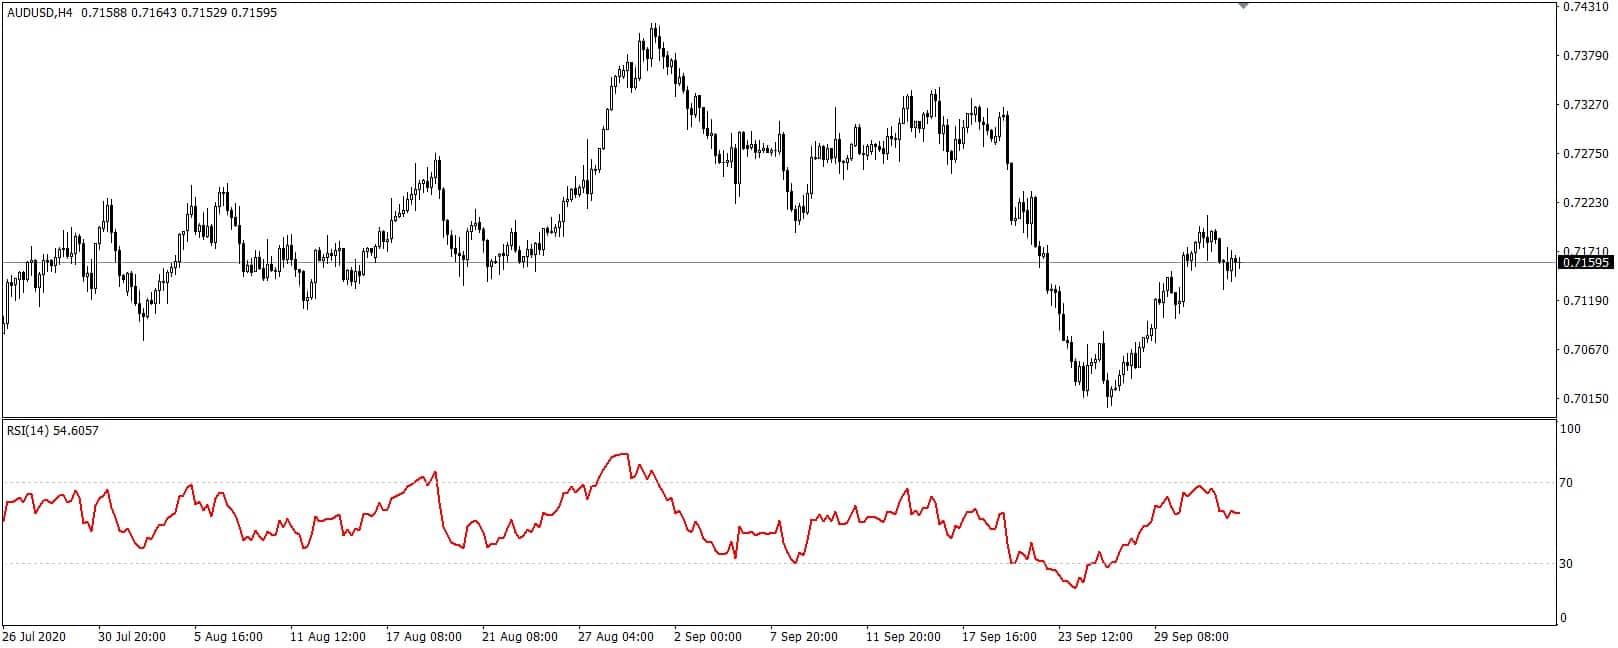 Relative strenght index indicator MetaTrader 4